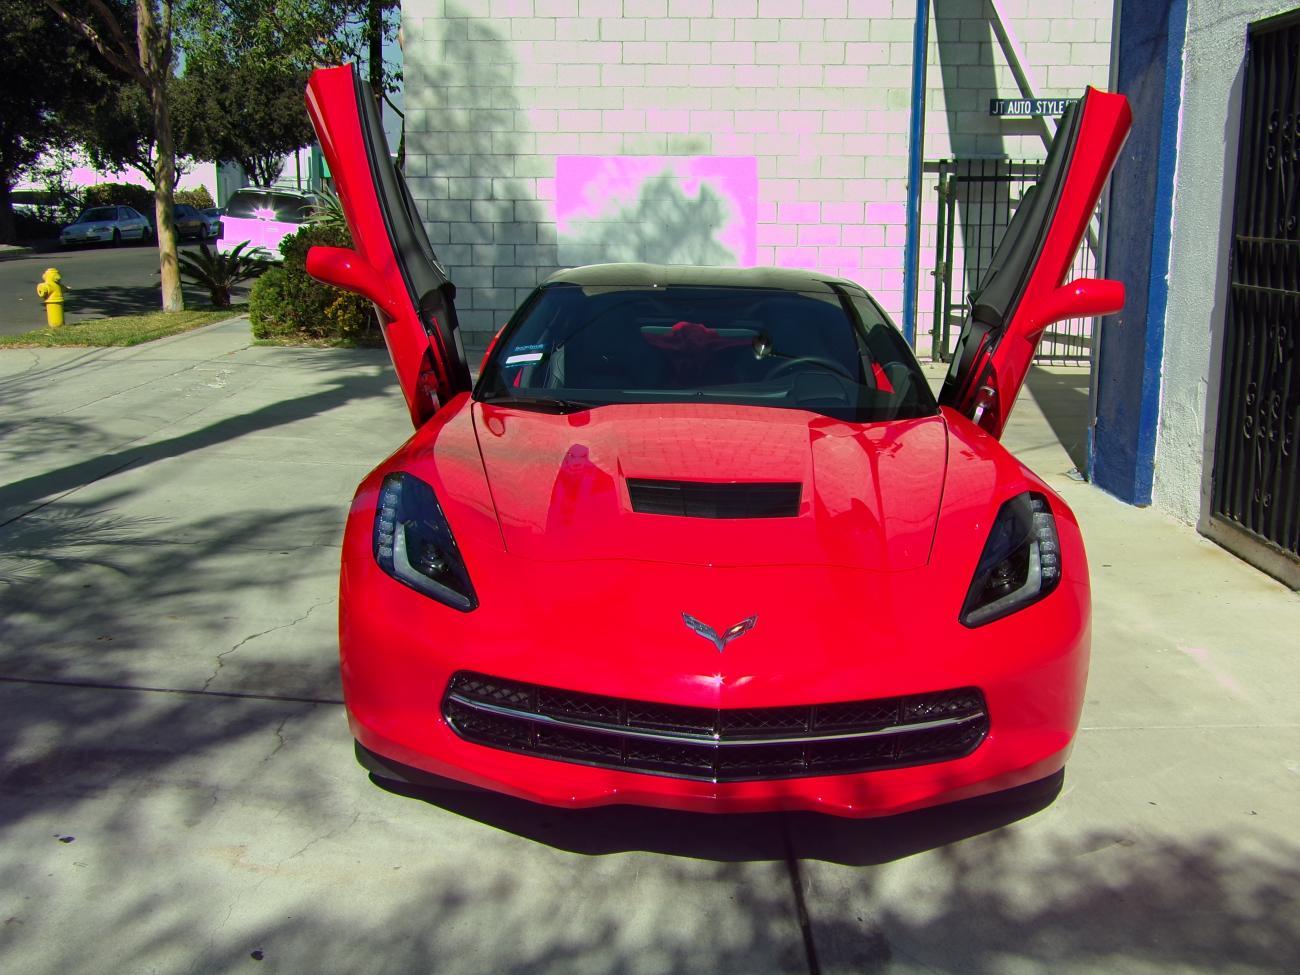 lambo vertical doors corvetteforum chevrolet corvette forum discussion. Black Bedroom Furniture Sets. Home Design Ideas